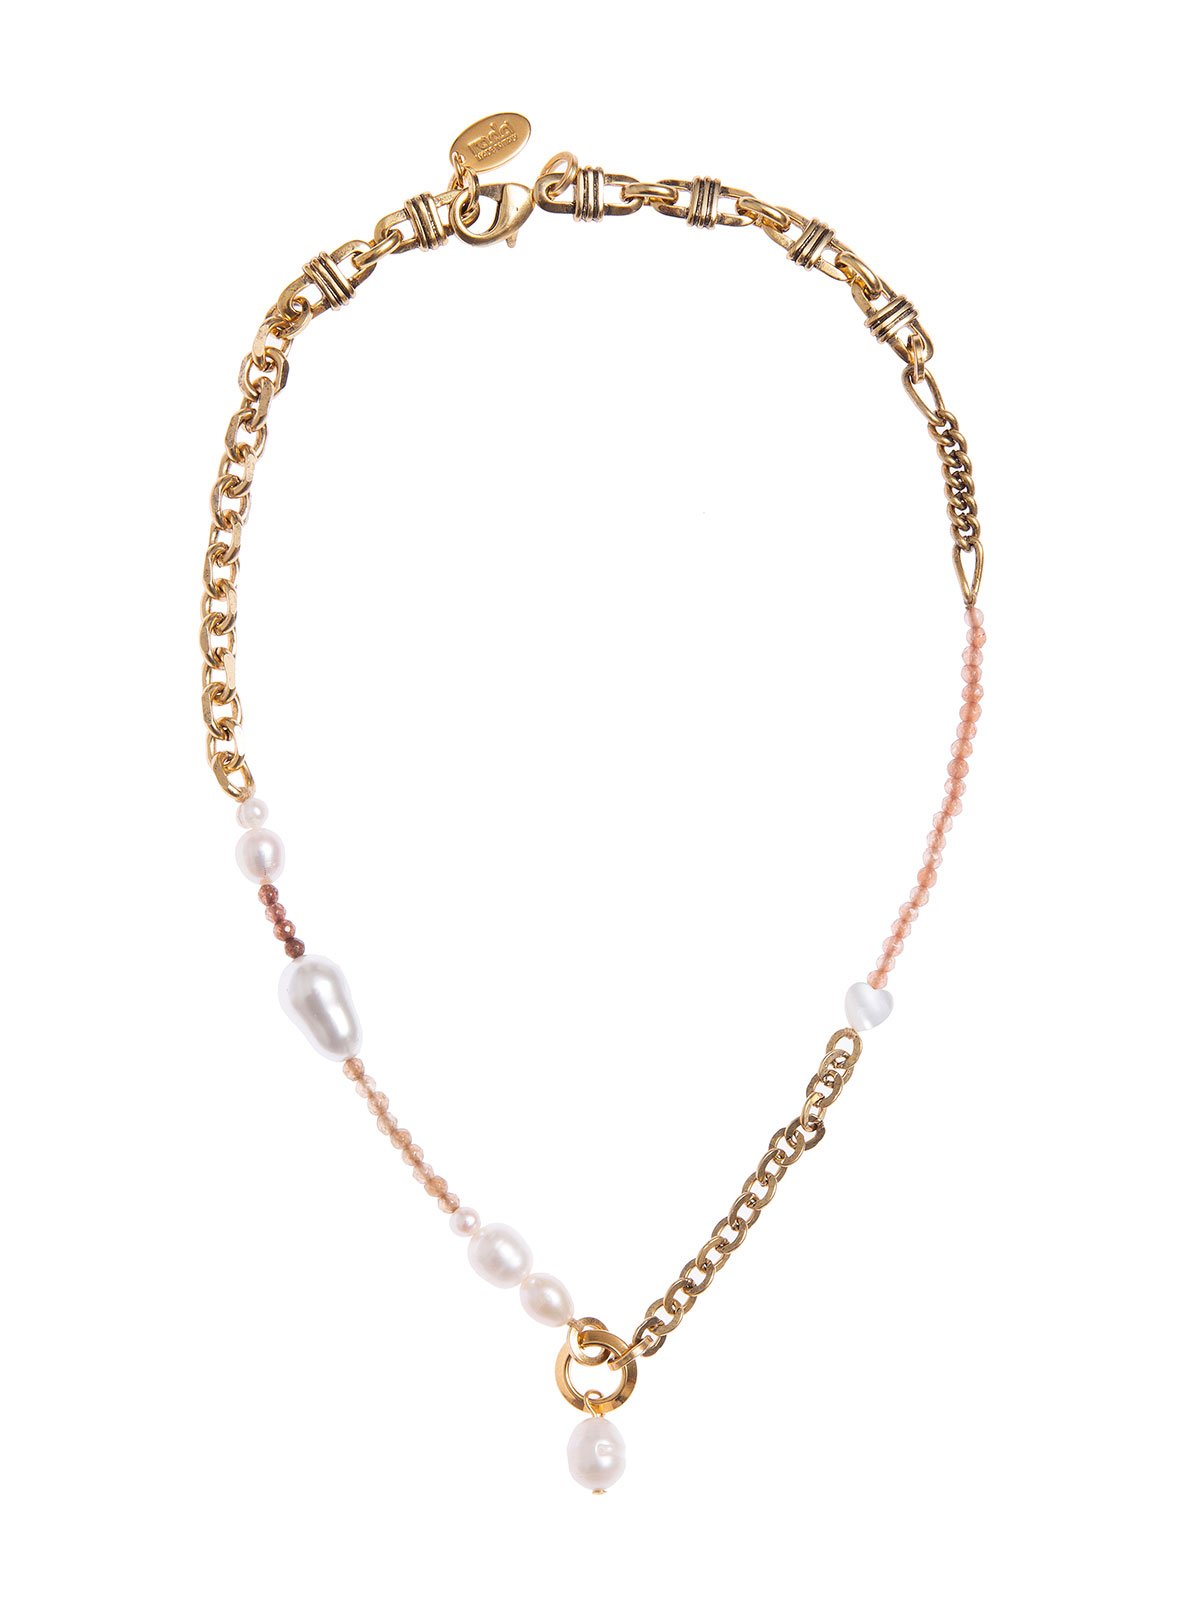 Collana catena, giada e perle di fiume